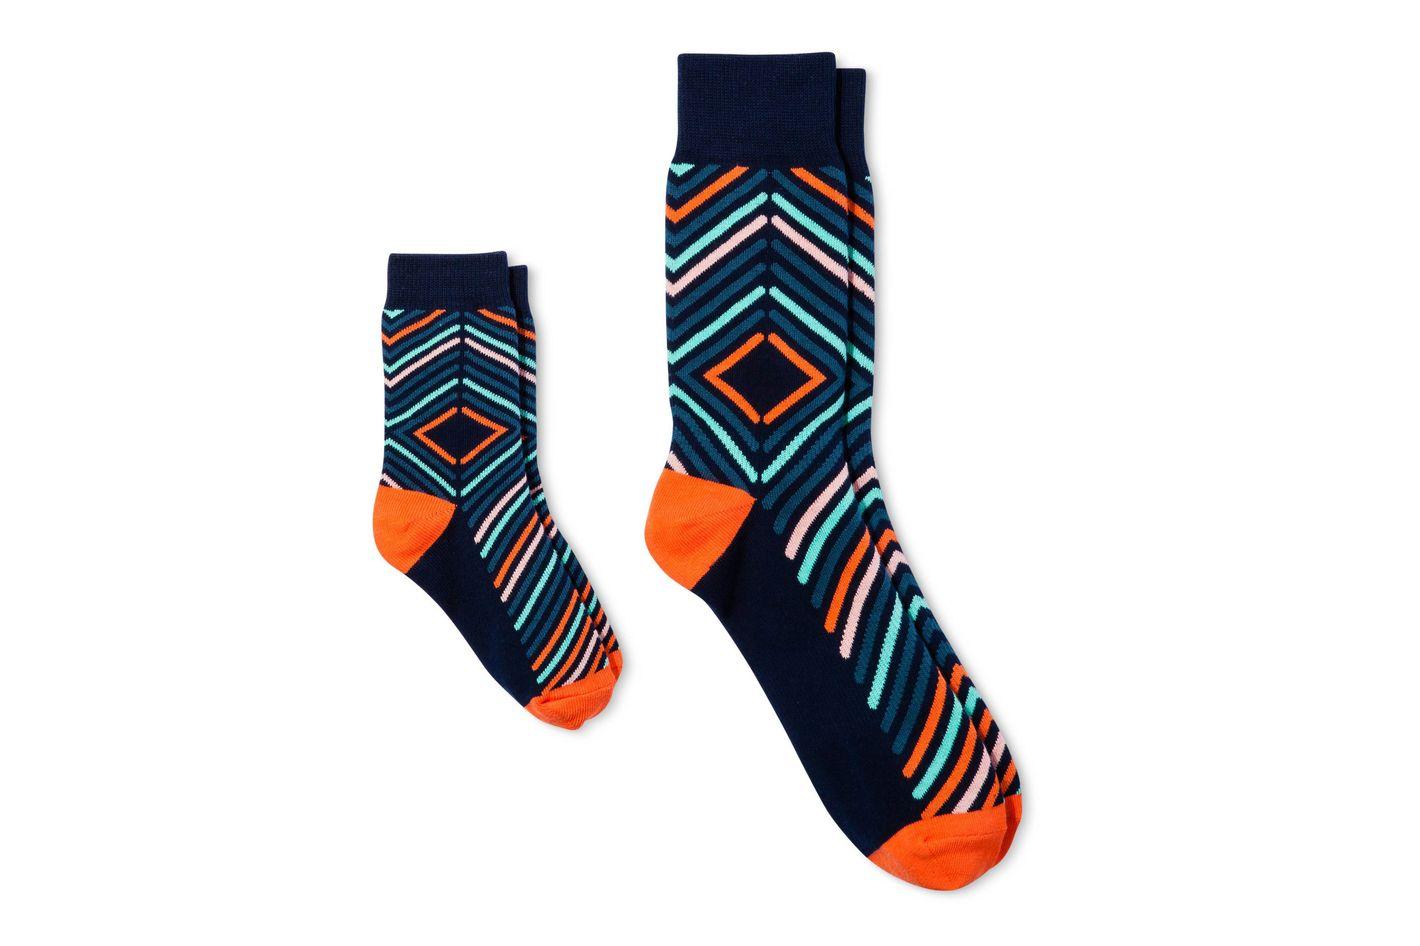 Pair of Thieves Men's Kid/Dad Crew Socks With Micro Stripe 2 Pack